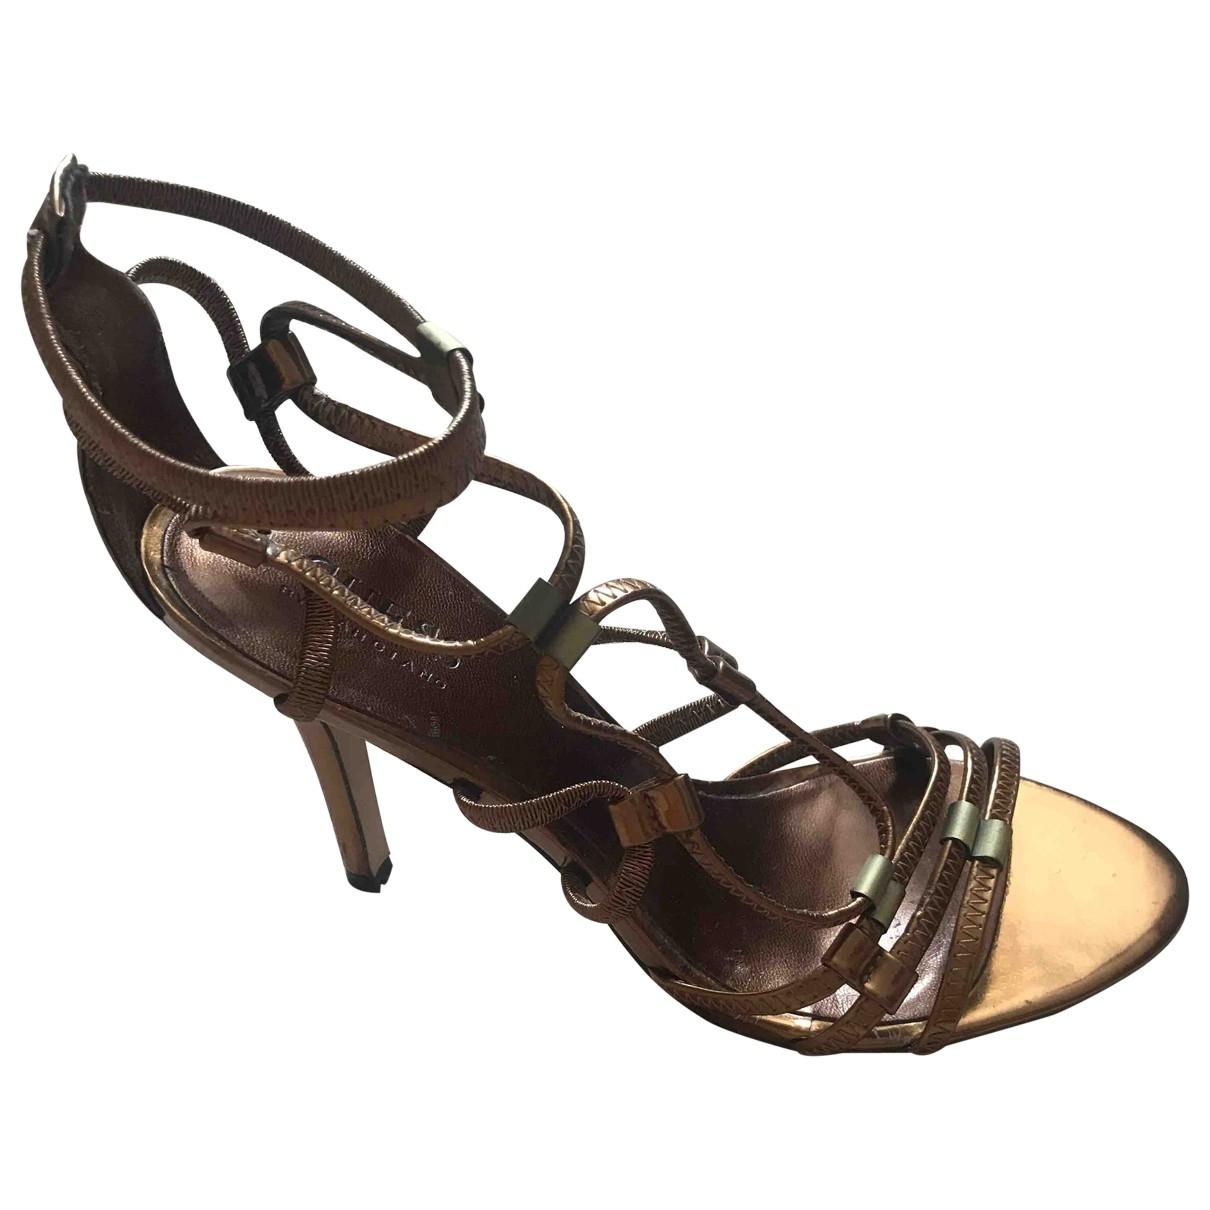 Sandalias romanas de Charol Guess